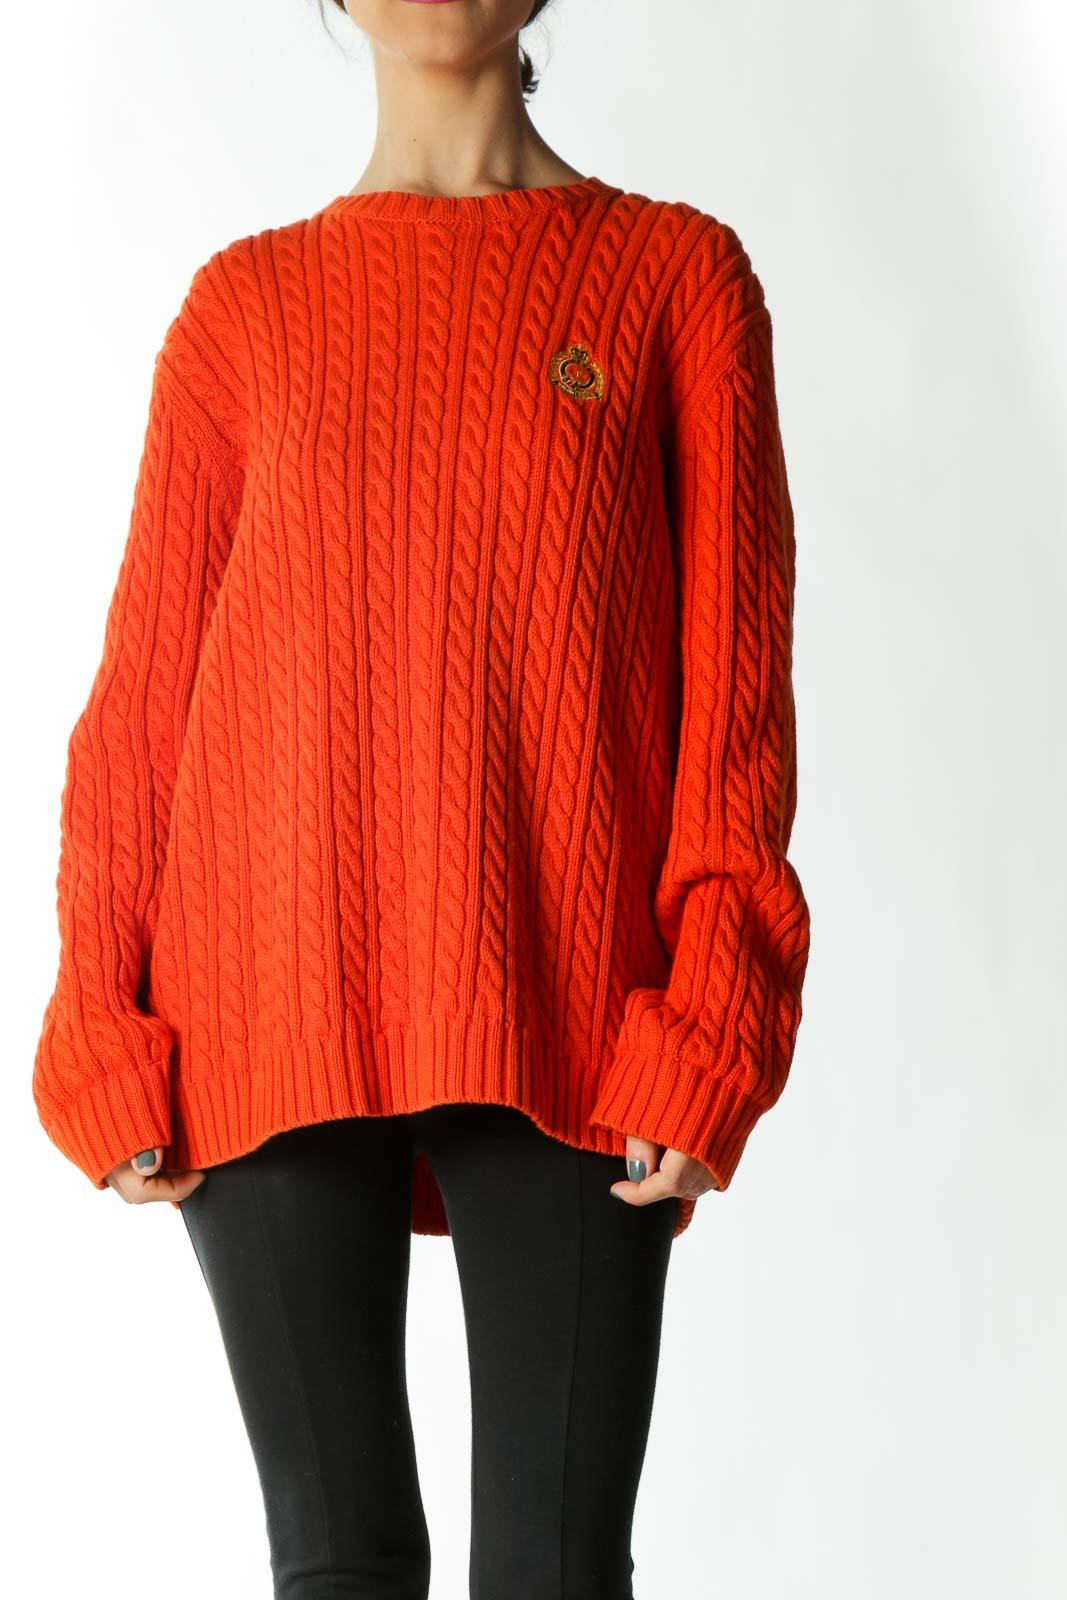 Orange Cable Knit Crest Crew-Neck Sweater